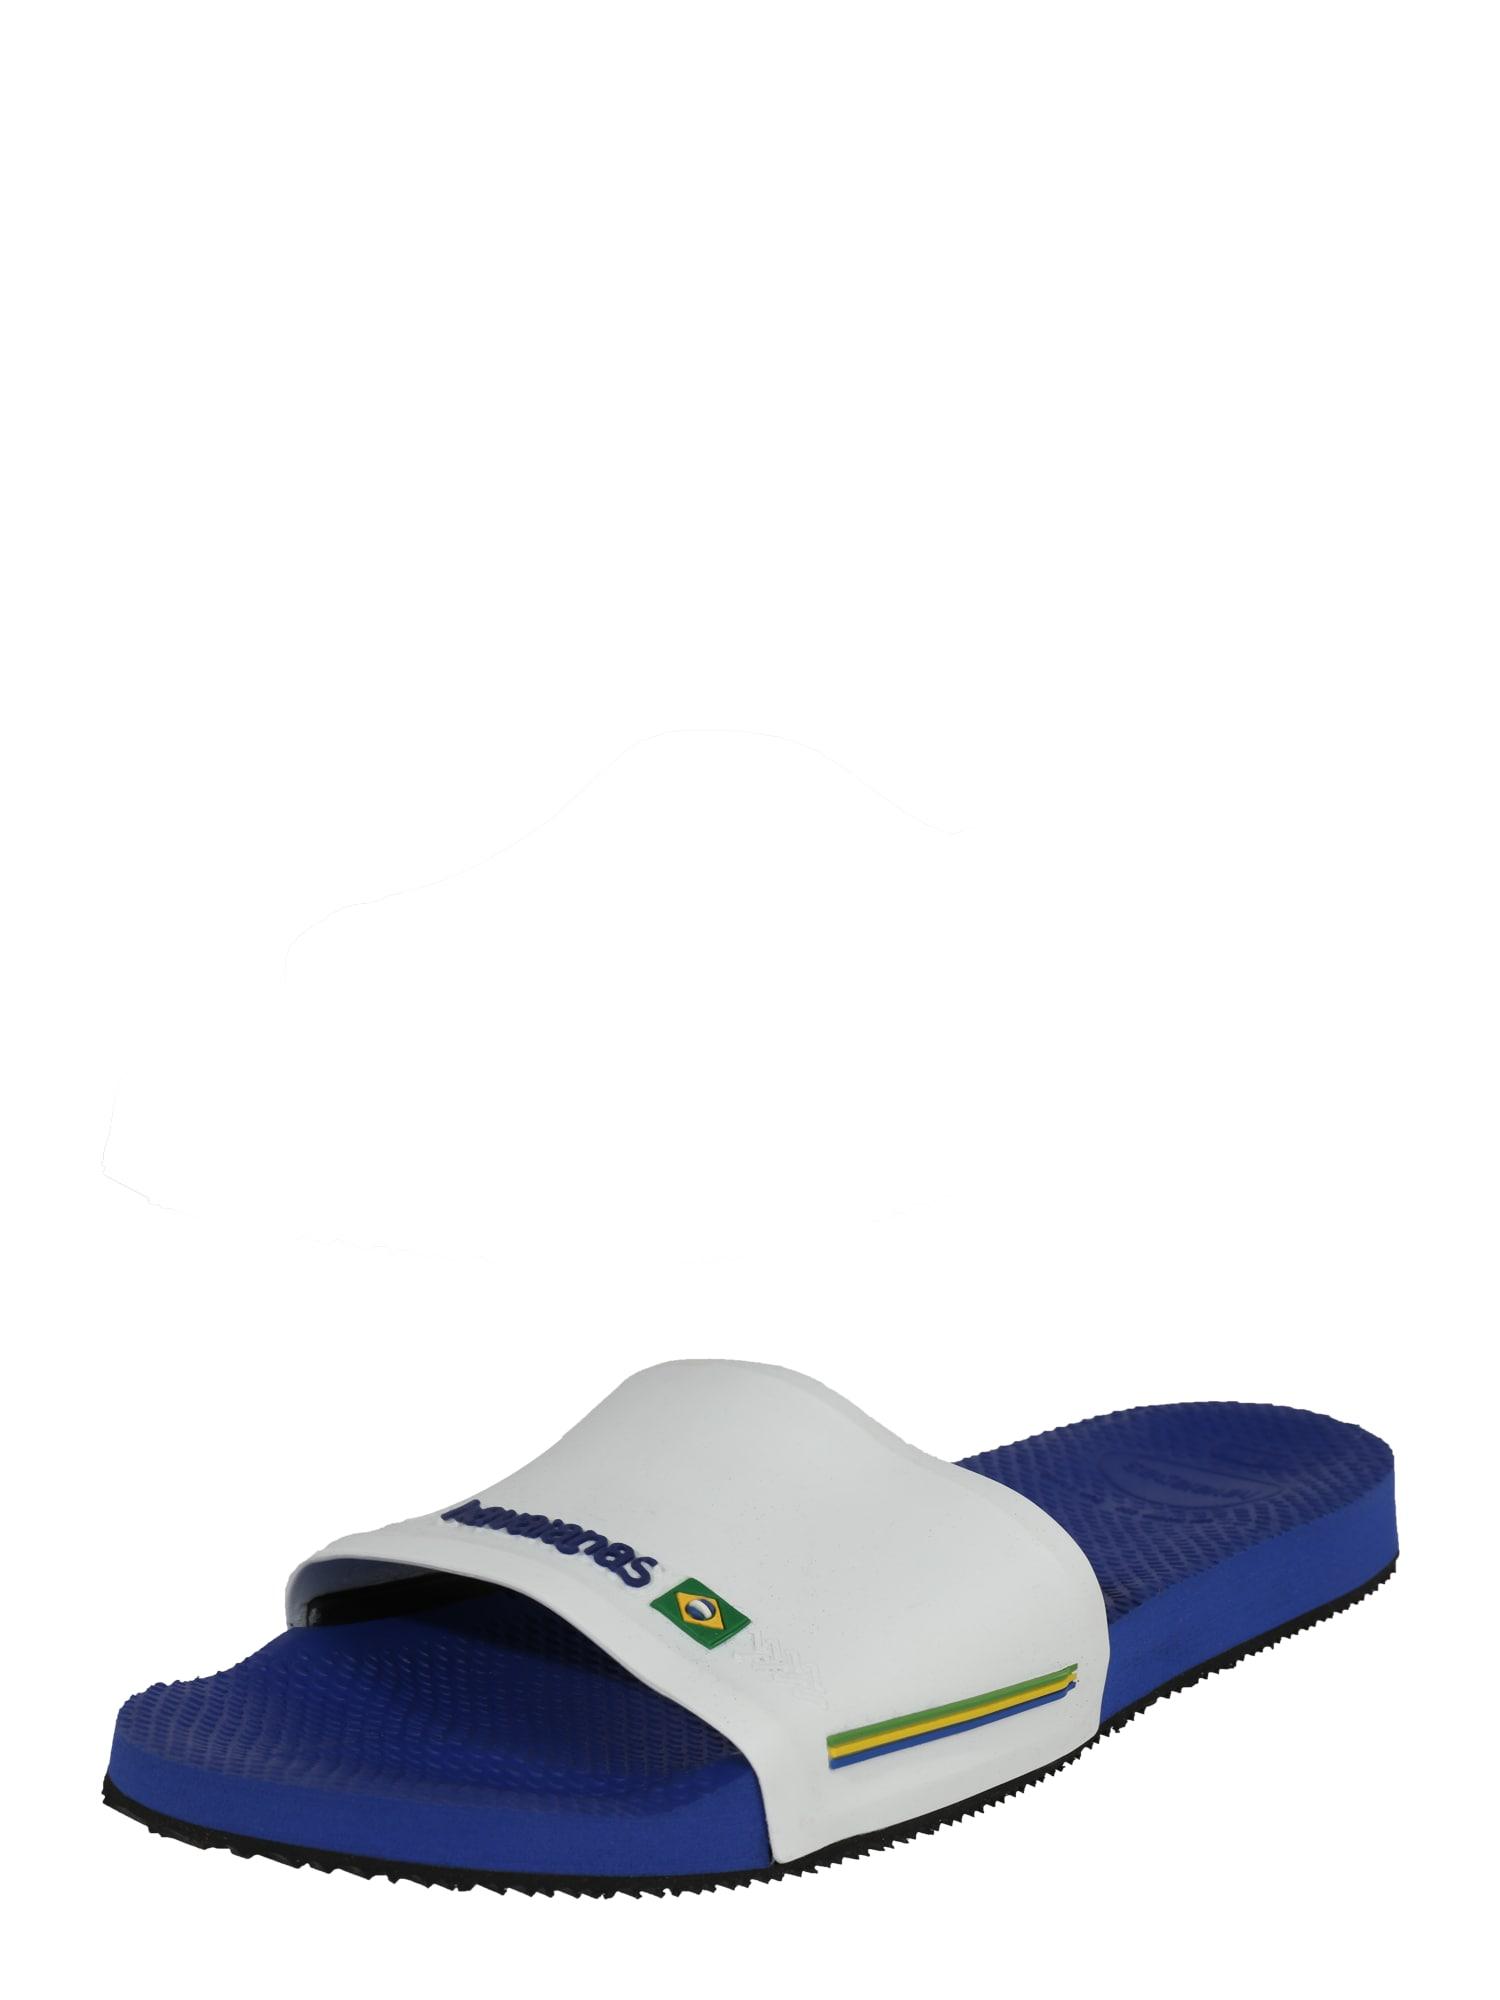 Pantofle Slide Brasil marine modrá bílá HAVAIANAS